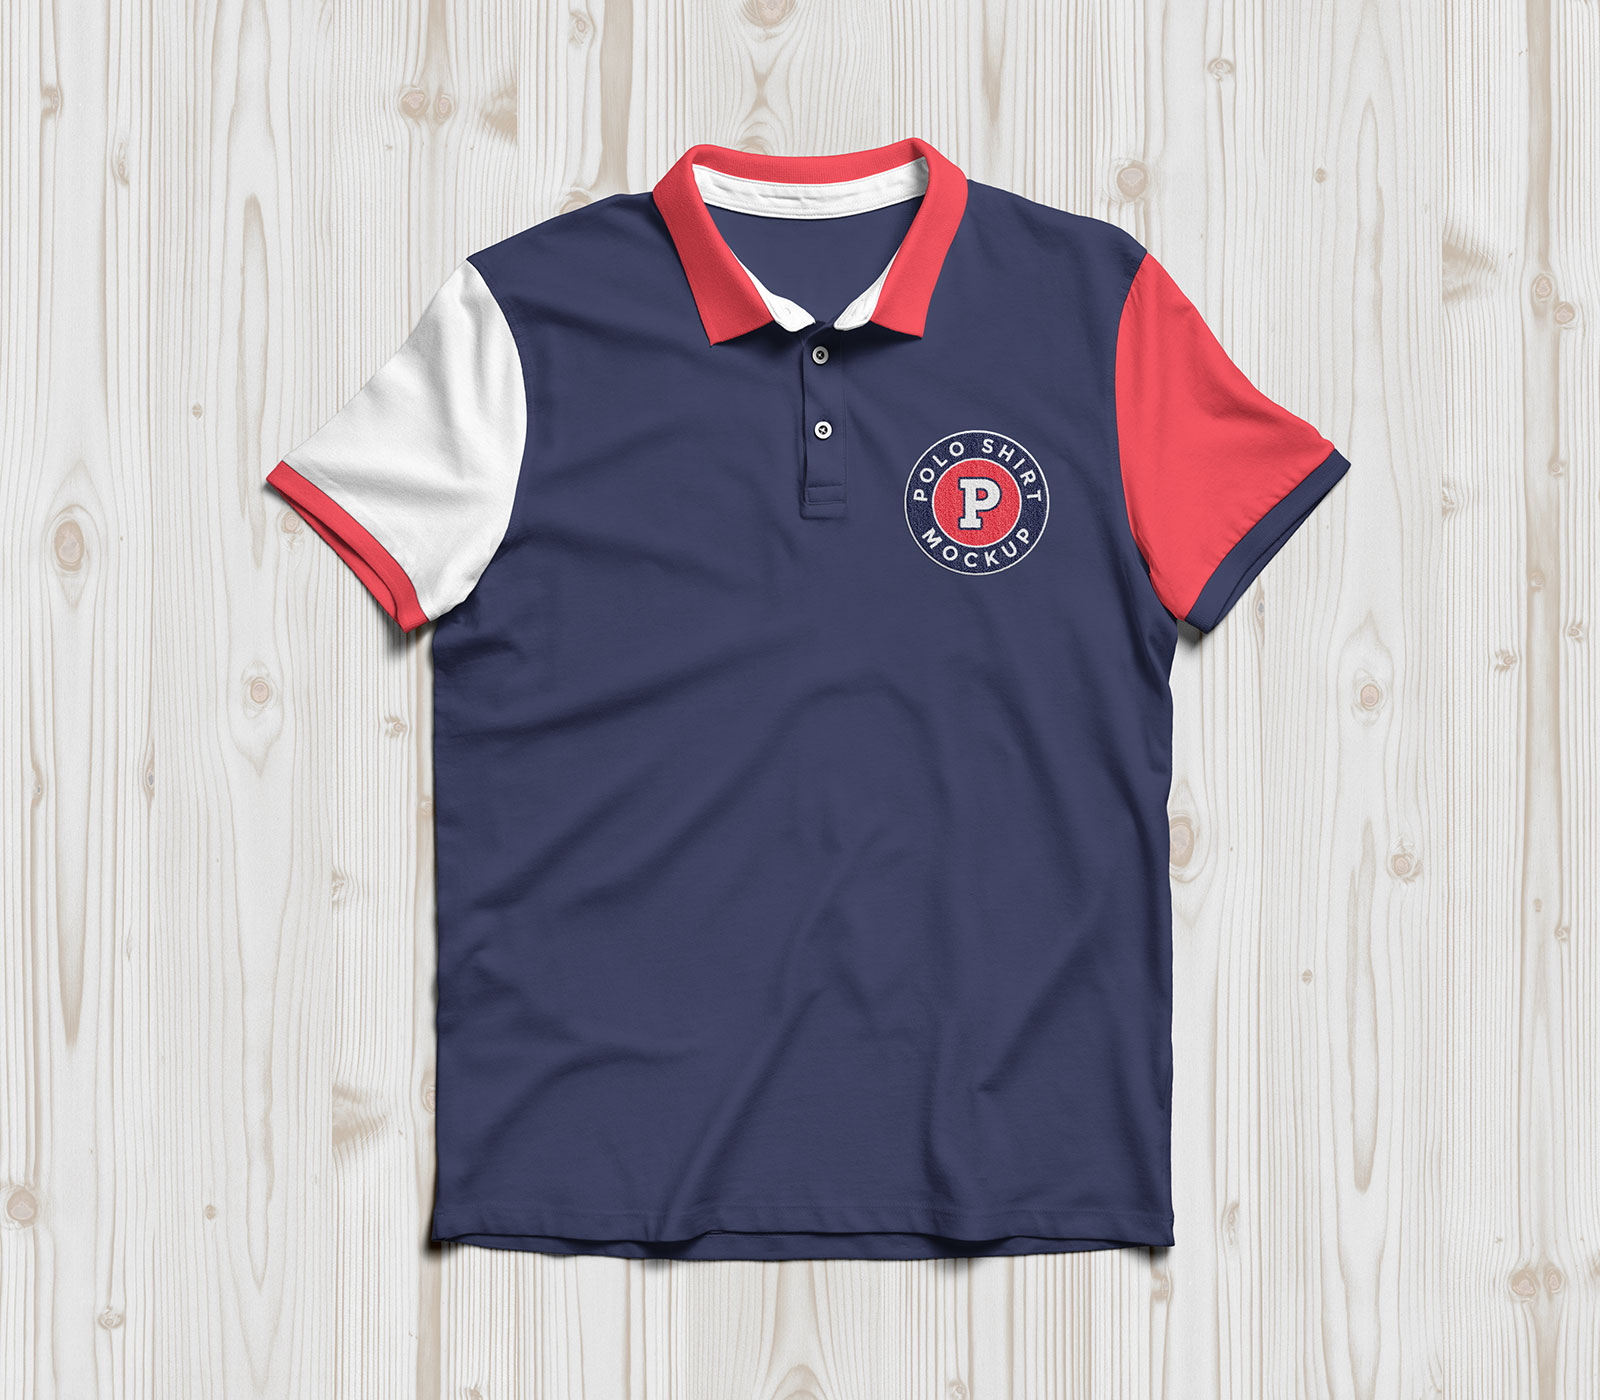 Free-Half-Sleeves-Polo-T-Shirt-Mockup-PSD-2